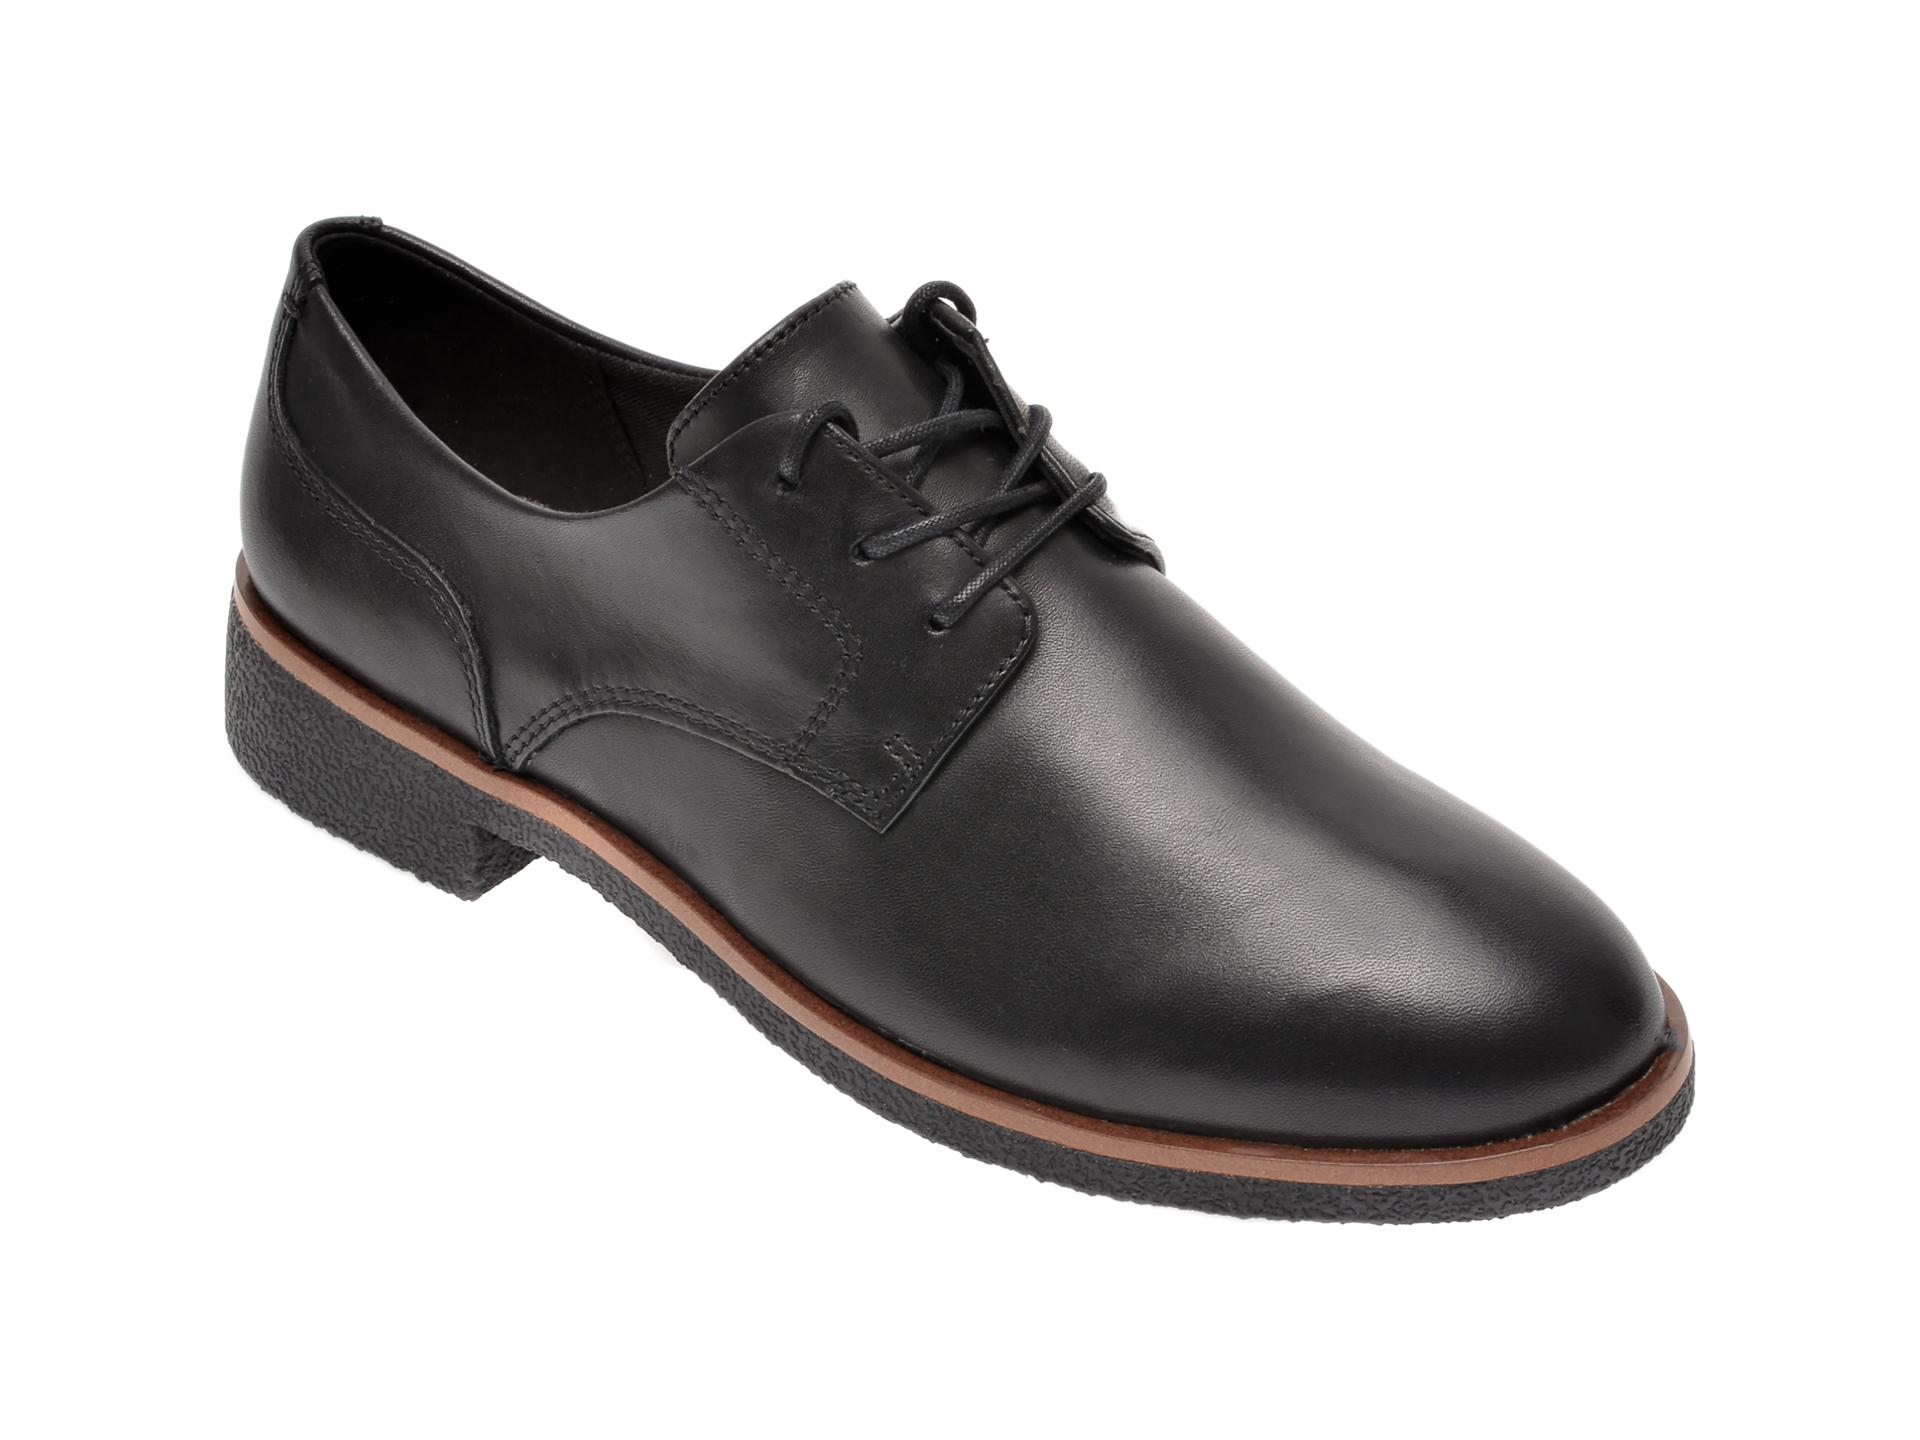 Pantofi CLARKS negri, Griffin Lane, din piele naturala imagine